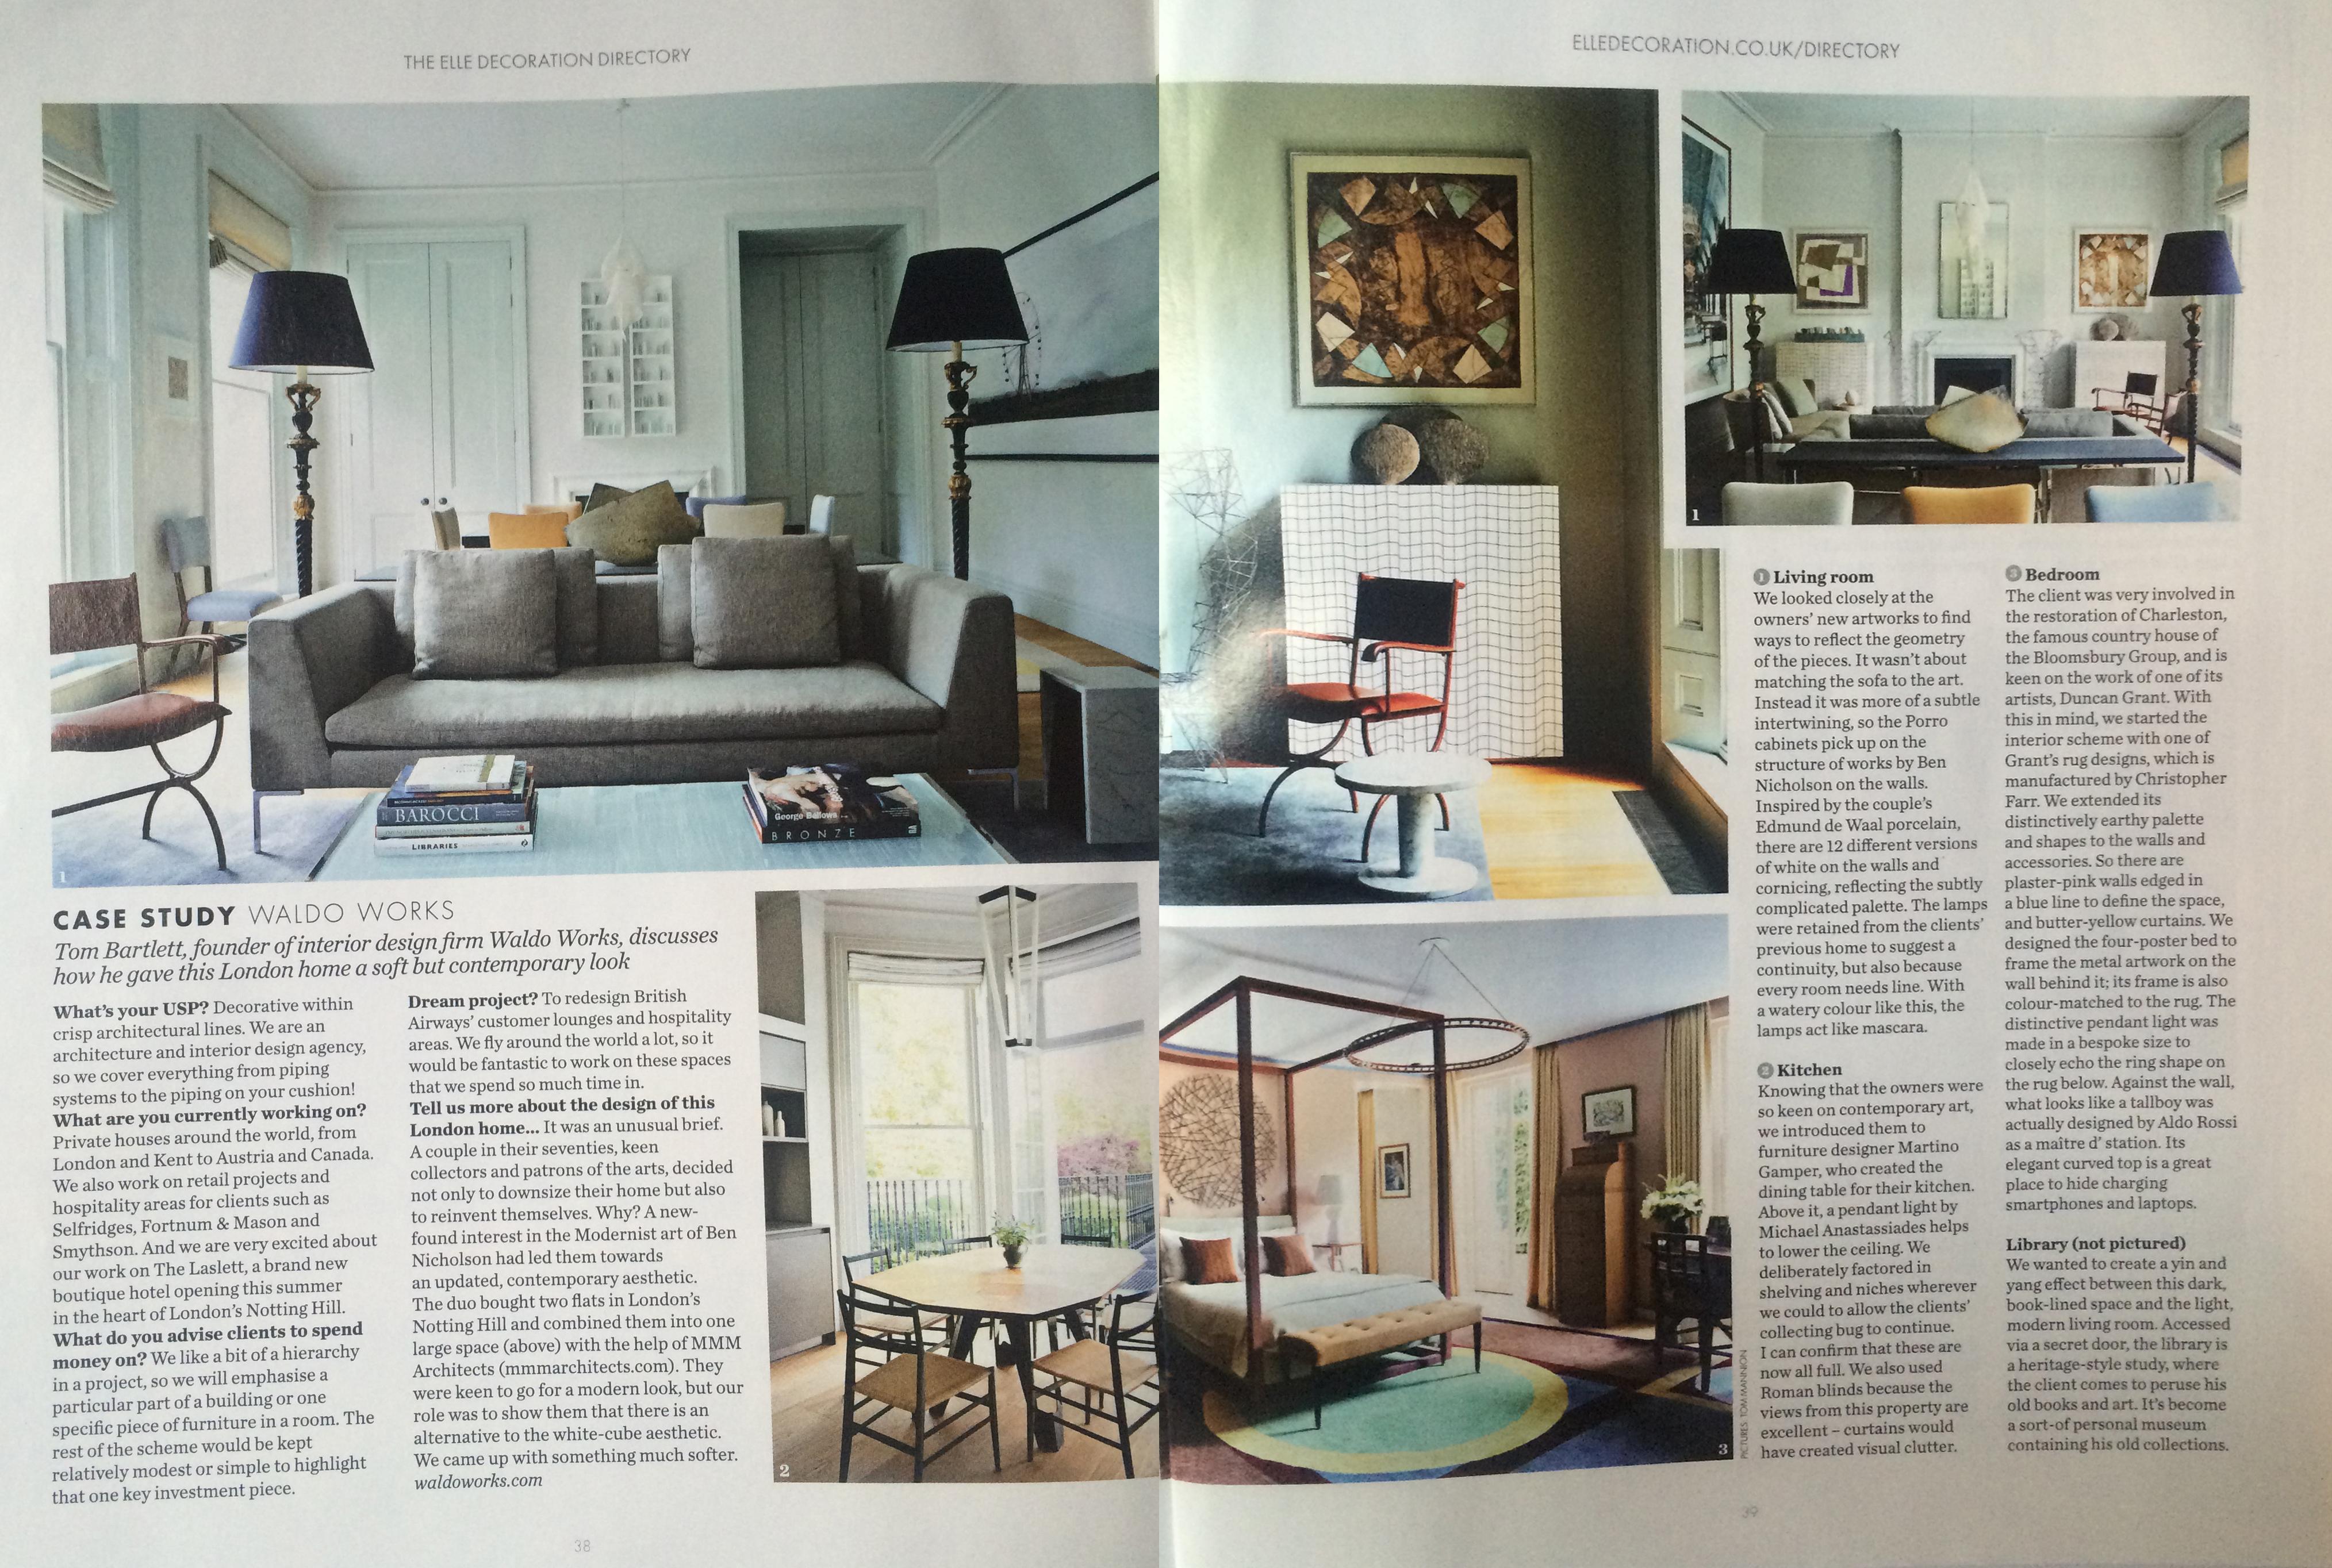 House decoration magazine uk campagne decoration home office cozy design ideas uk within tag - Home decoration campagne ...